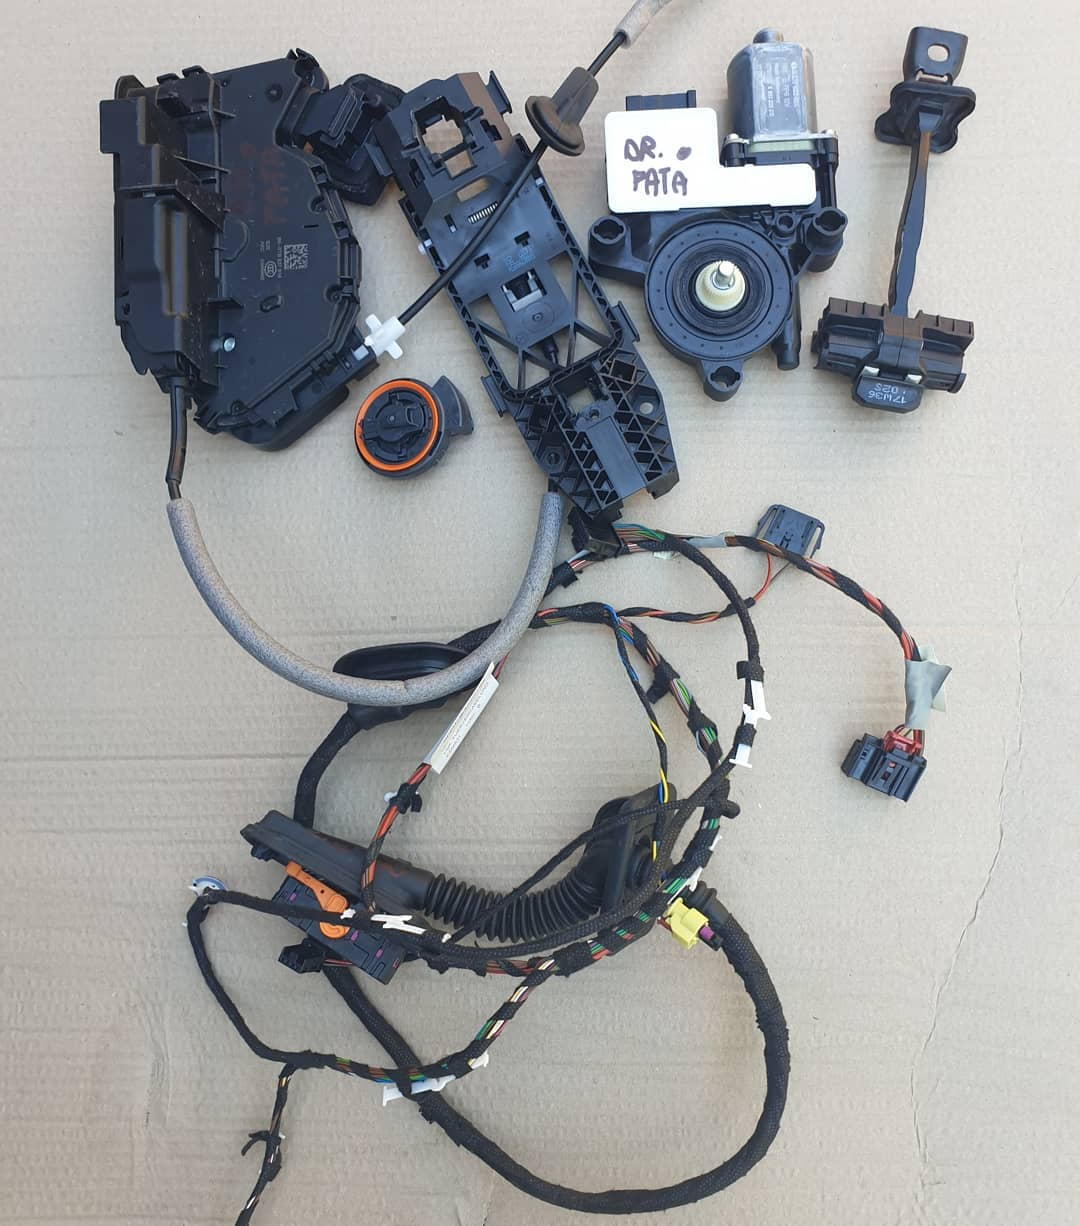 VW Polo Vl Macara geam, motoras geam, senzor impact, balama, instalatie, broasca, incuietoare plastic usa dreapta fata